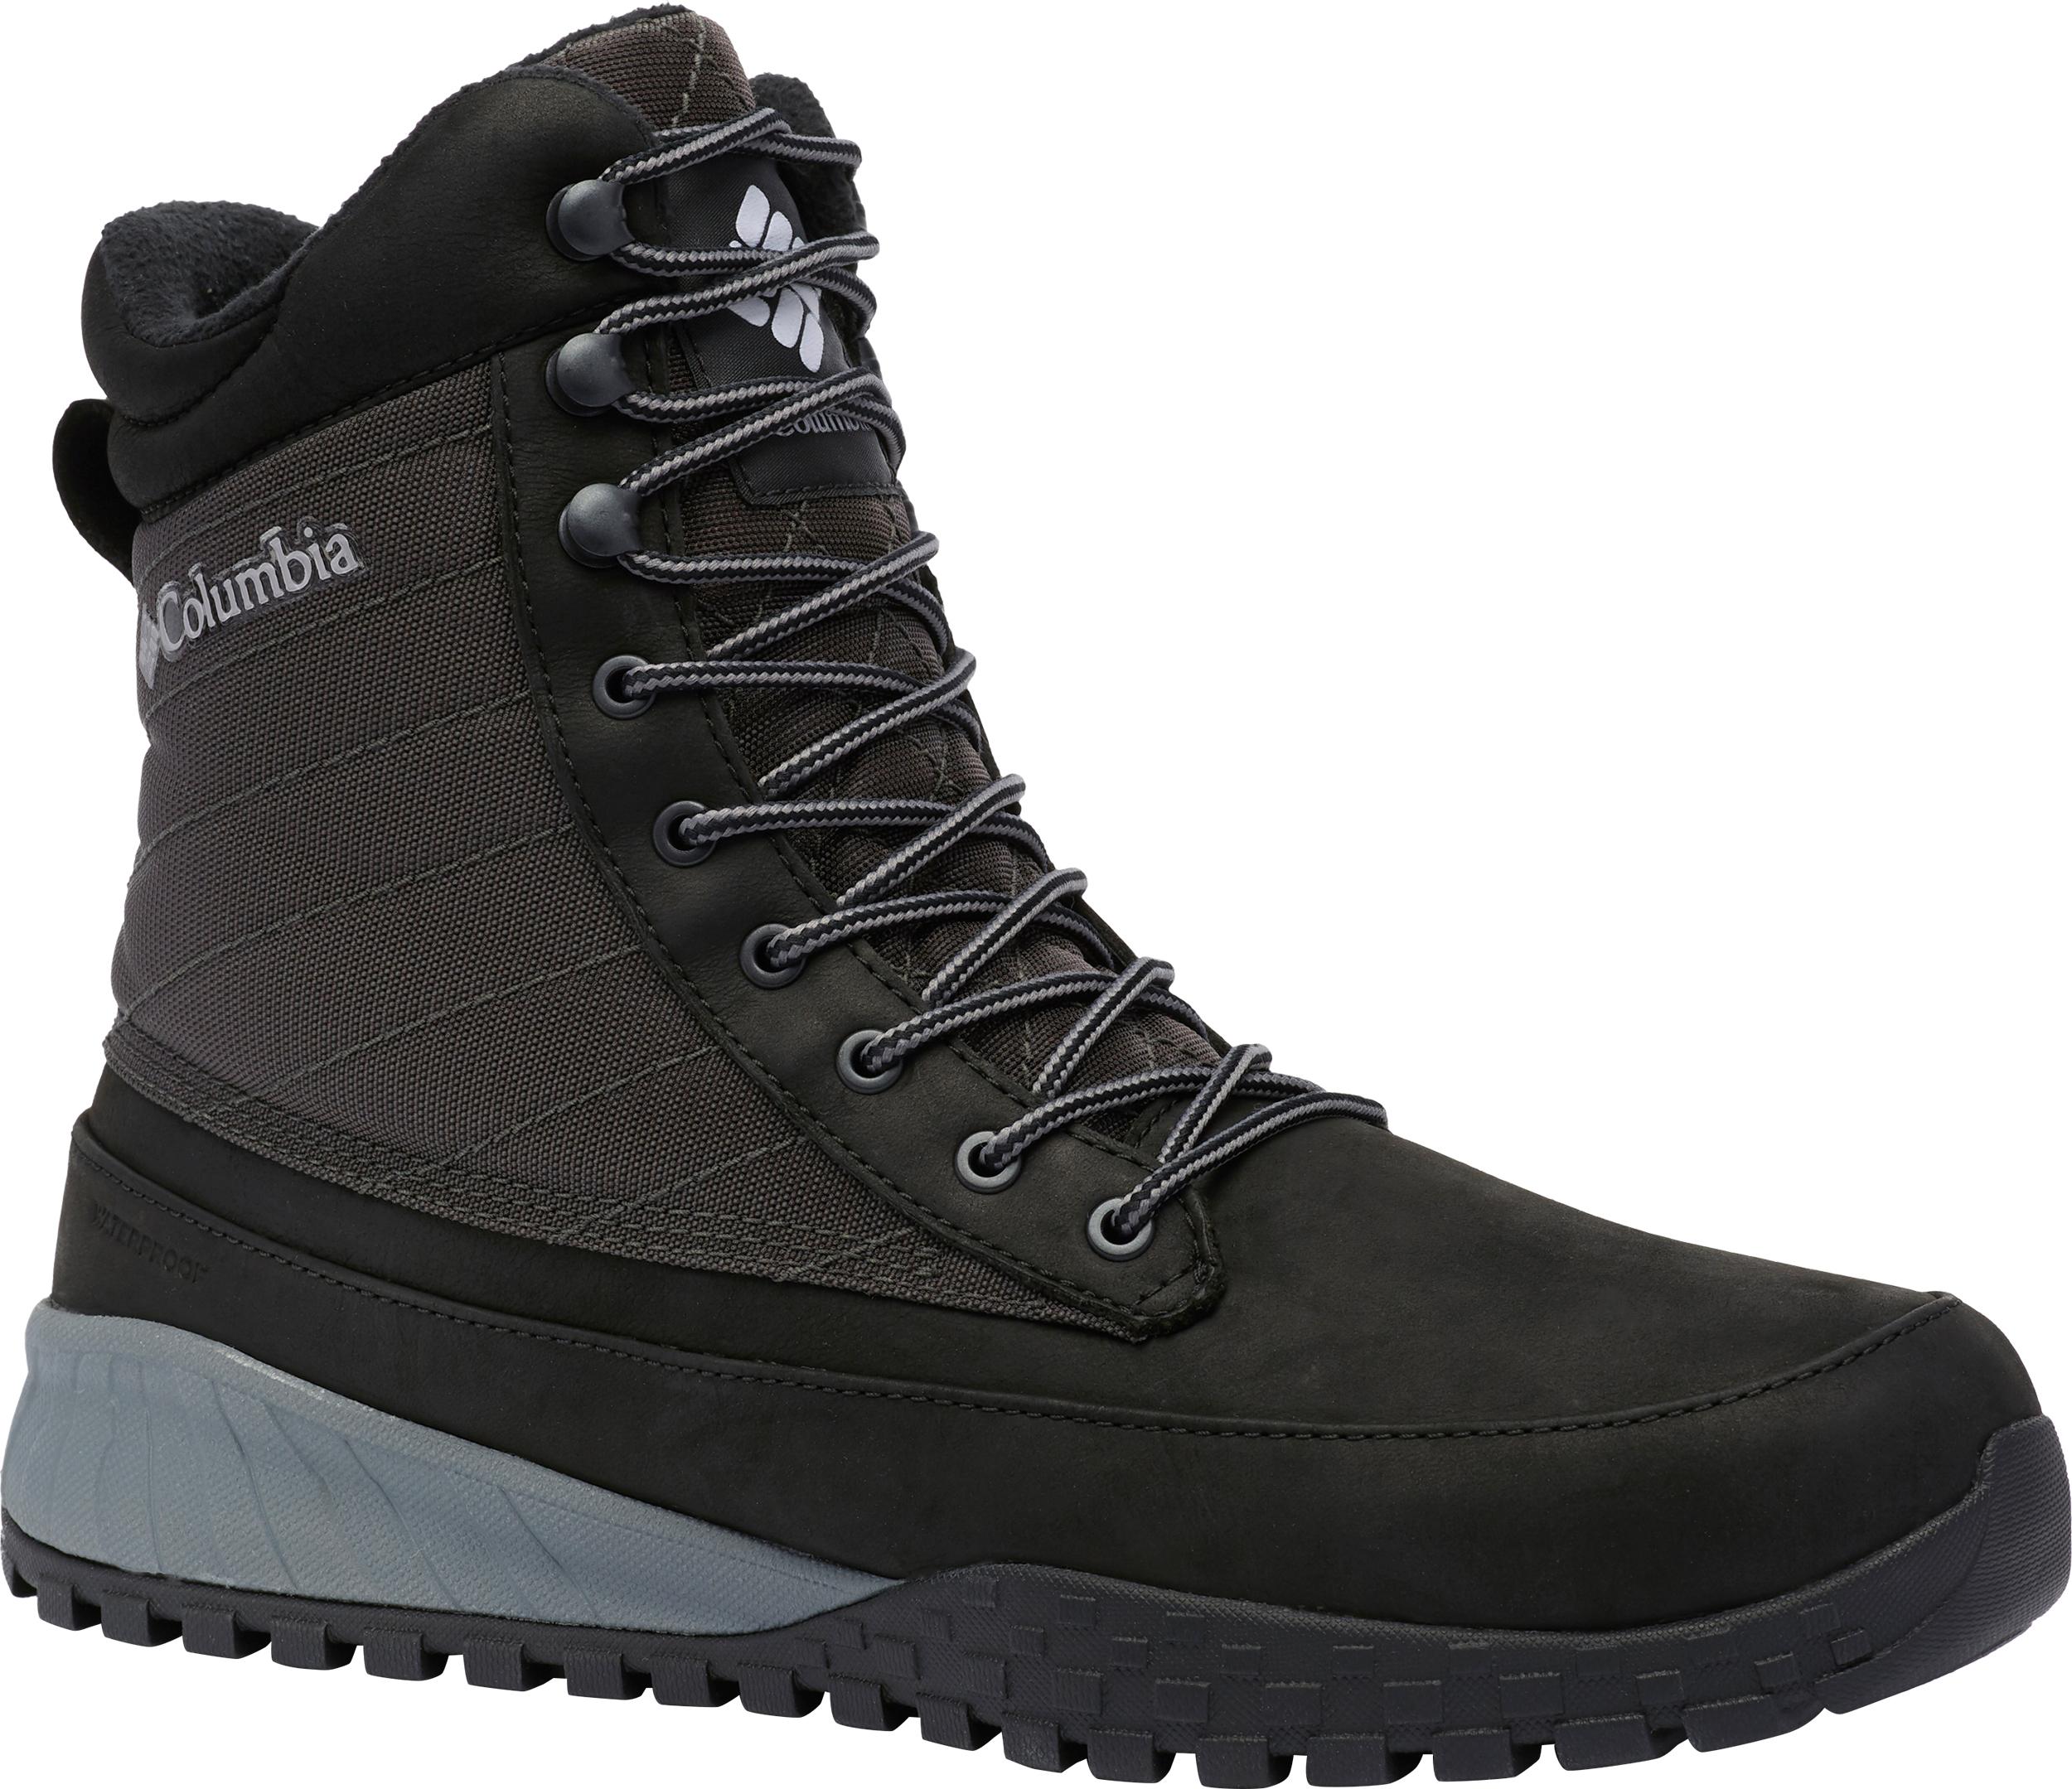 424737296 Columbia Fairbanks 1006 Winter Boots - Men's